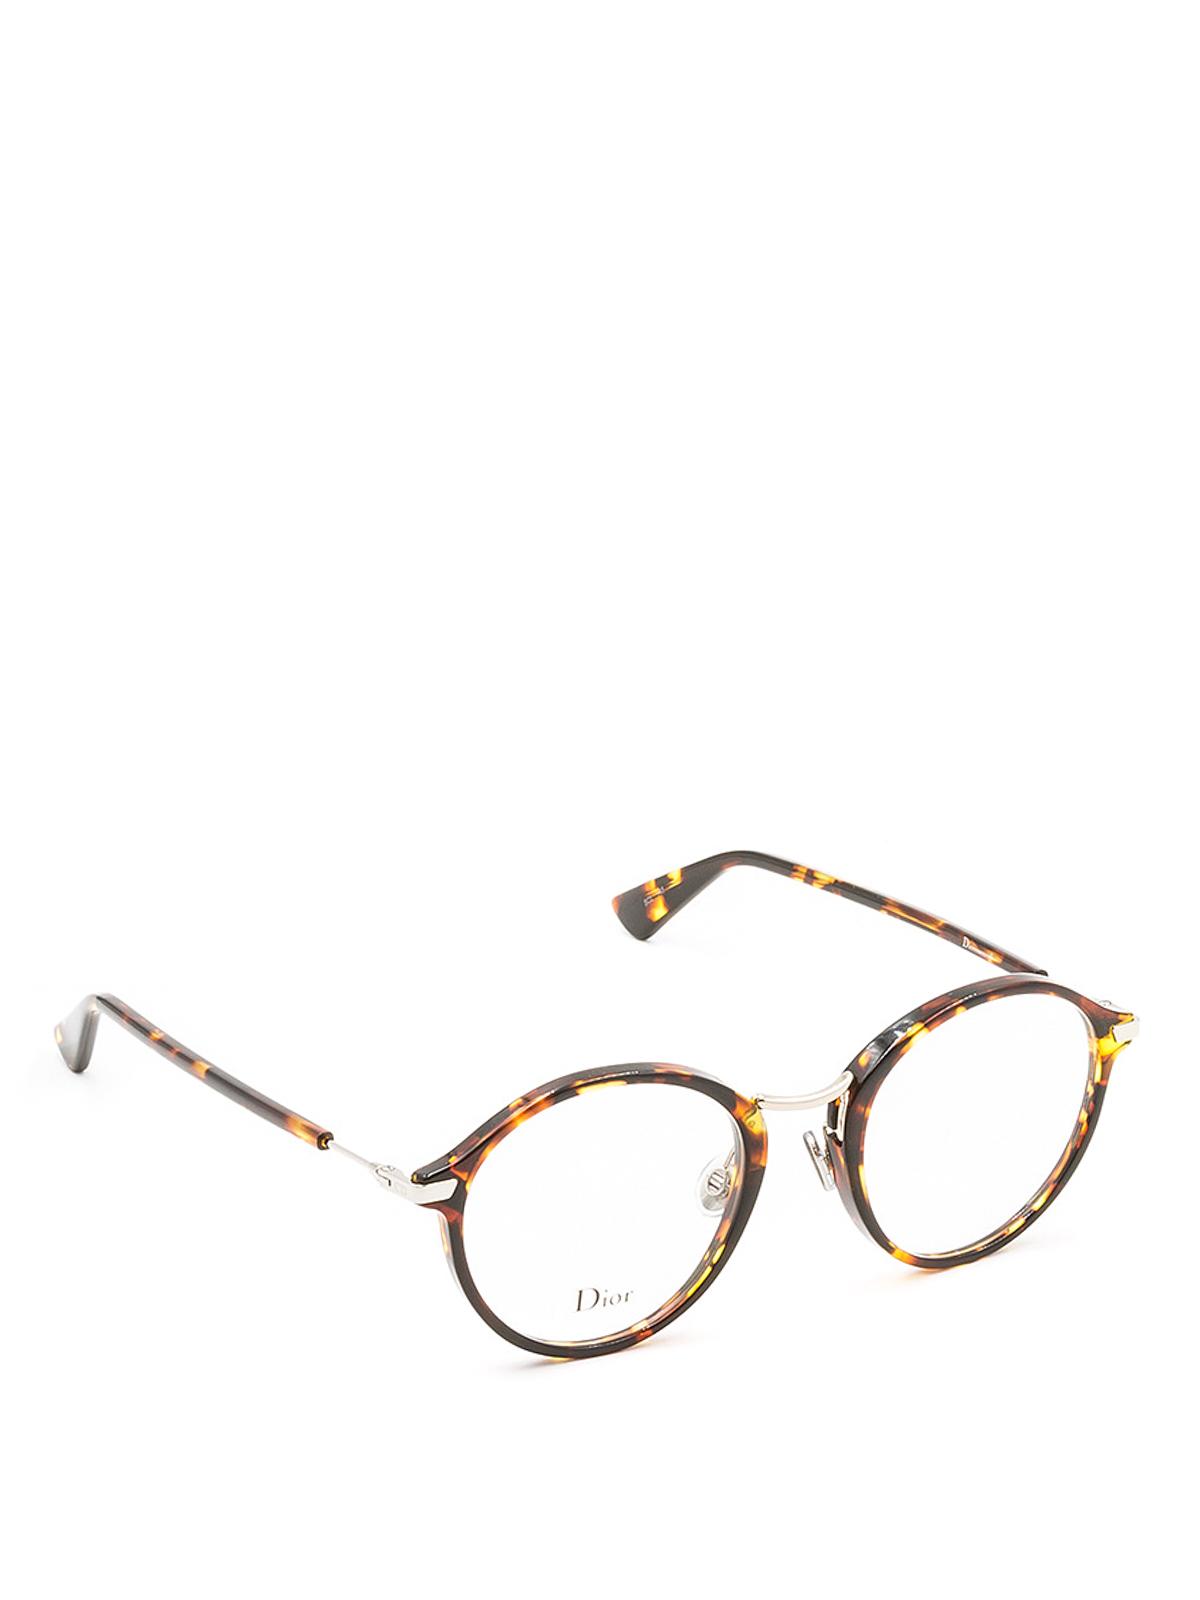 2274fb9e0768 Dior Optical Glasses